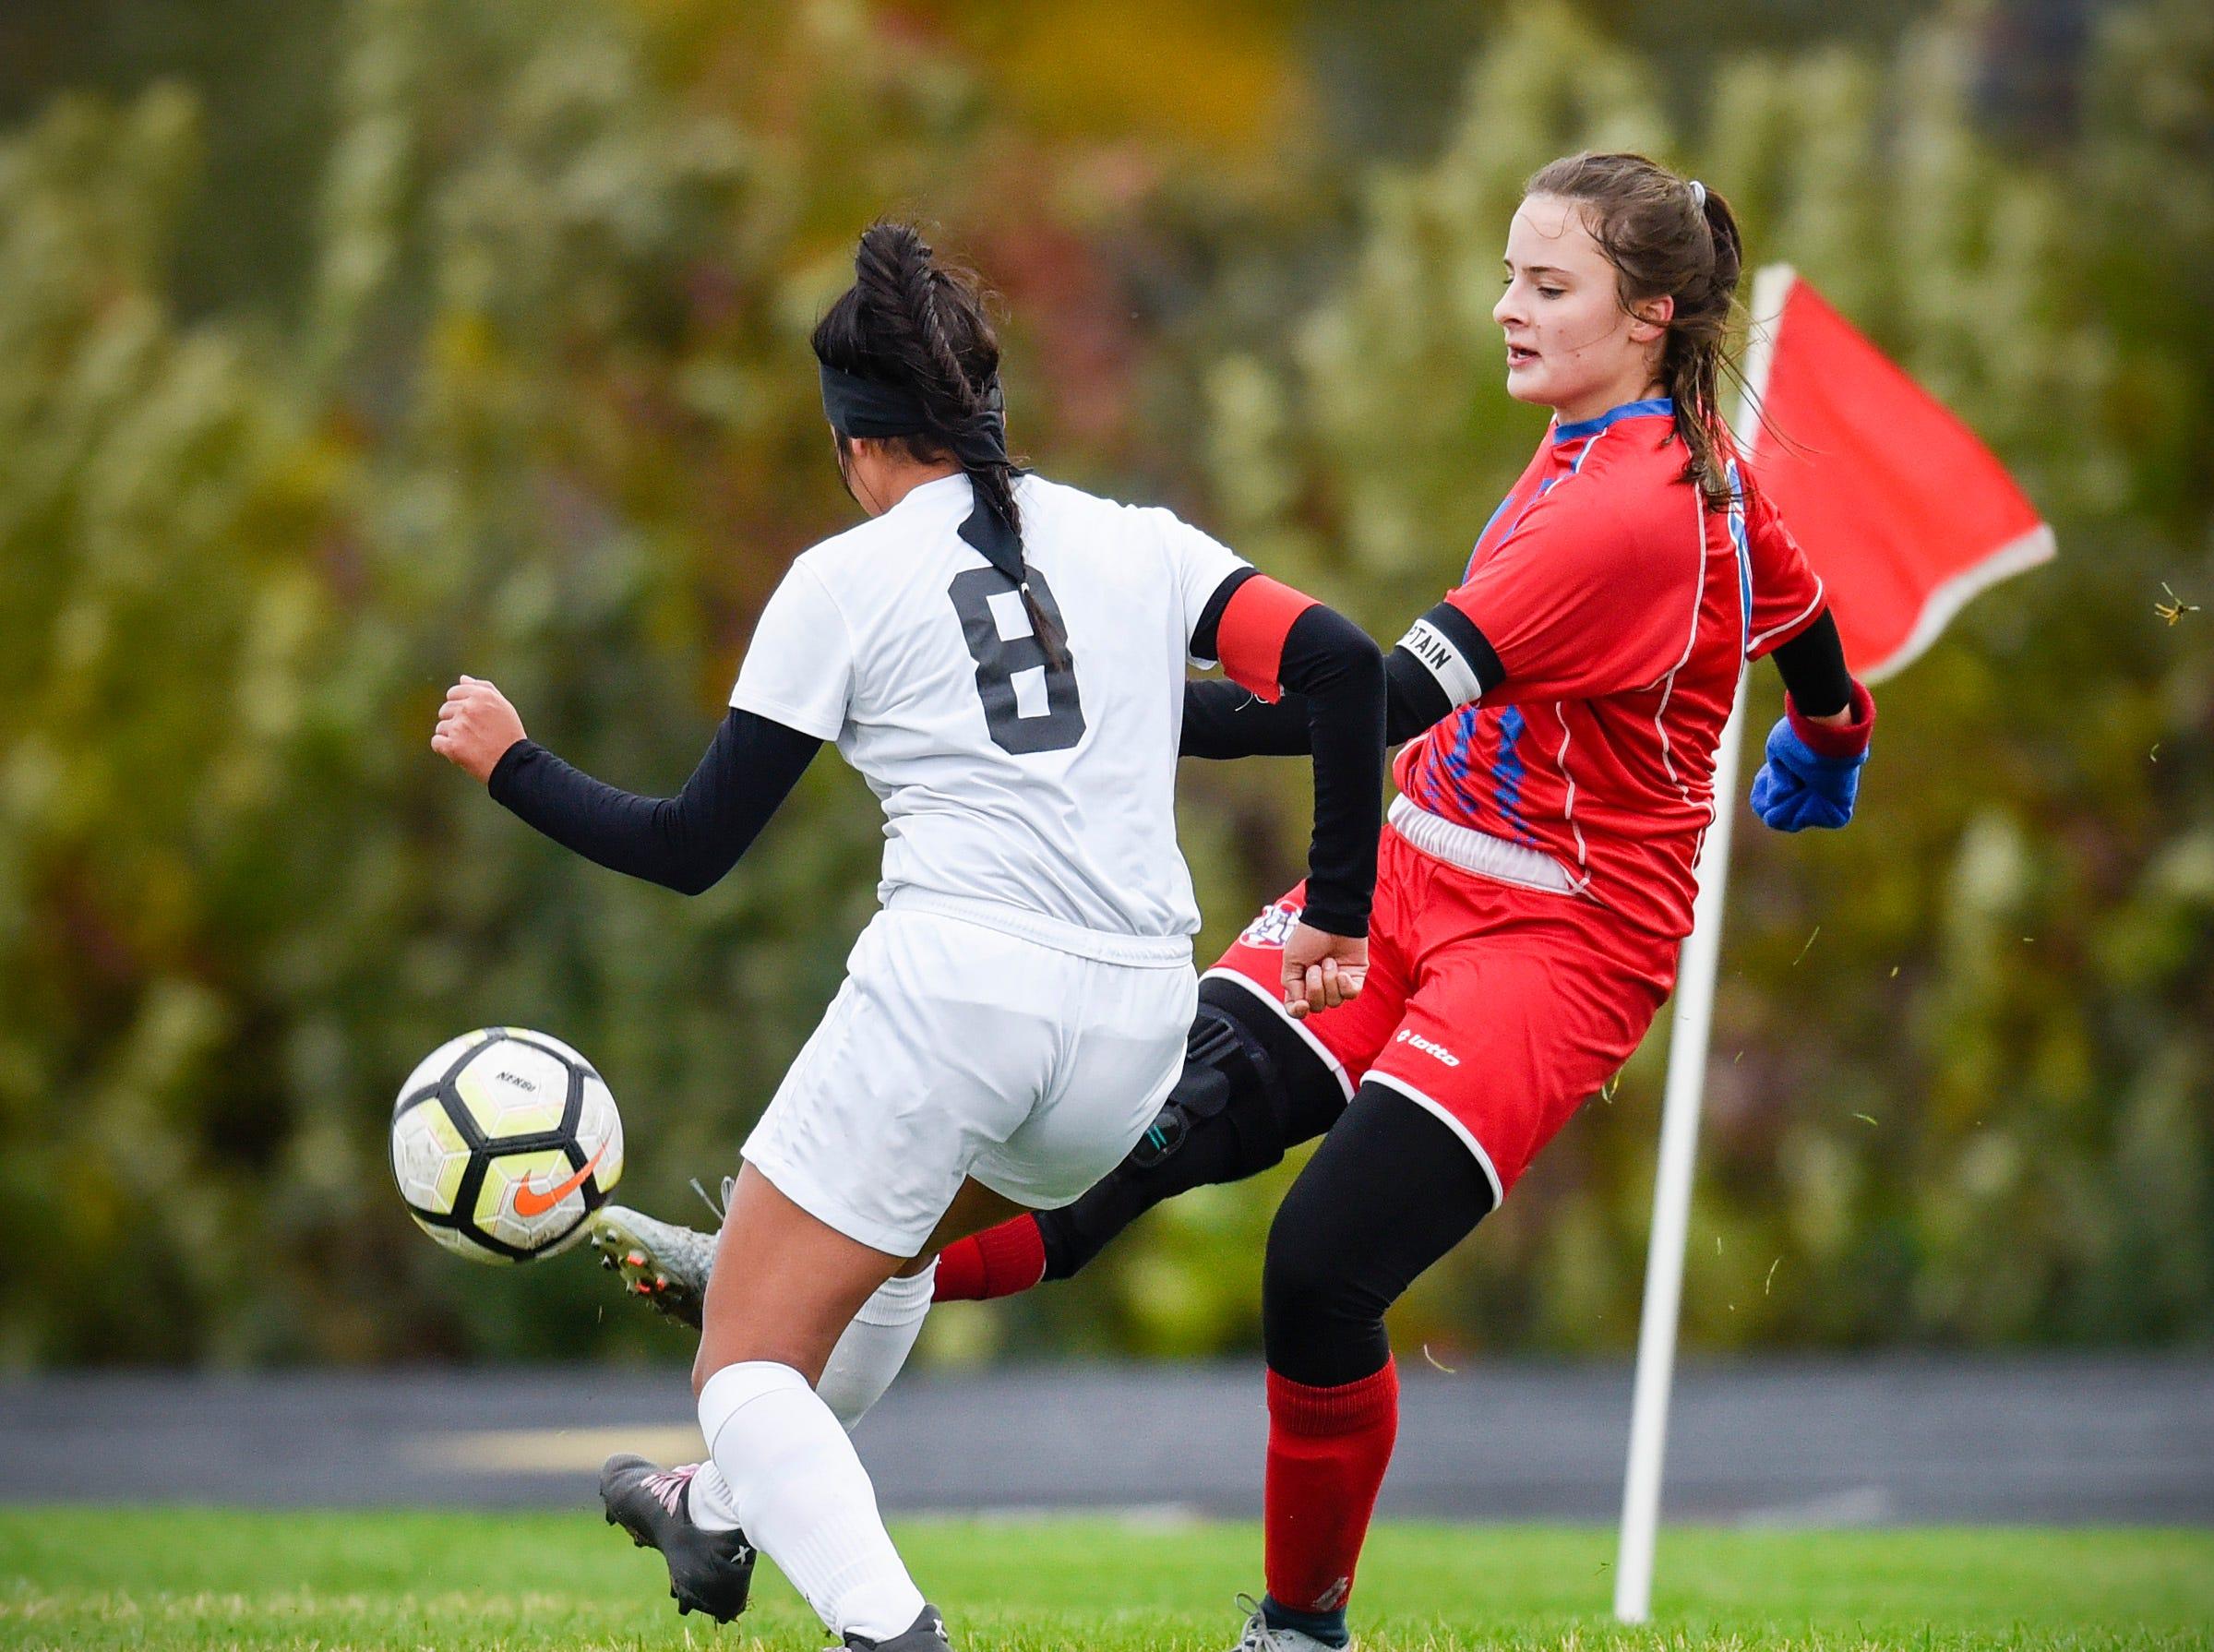 Apollo's Erica Thell kicks the ball past ROCORI's Jessica Salas during the first half Thursday, Oct. 11, at Apollo High School.